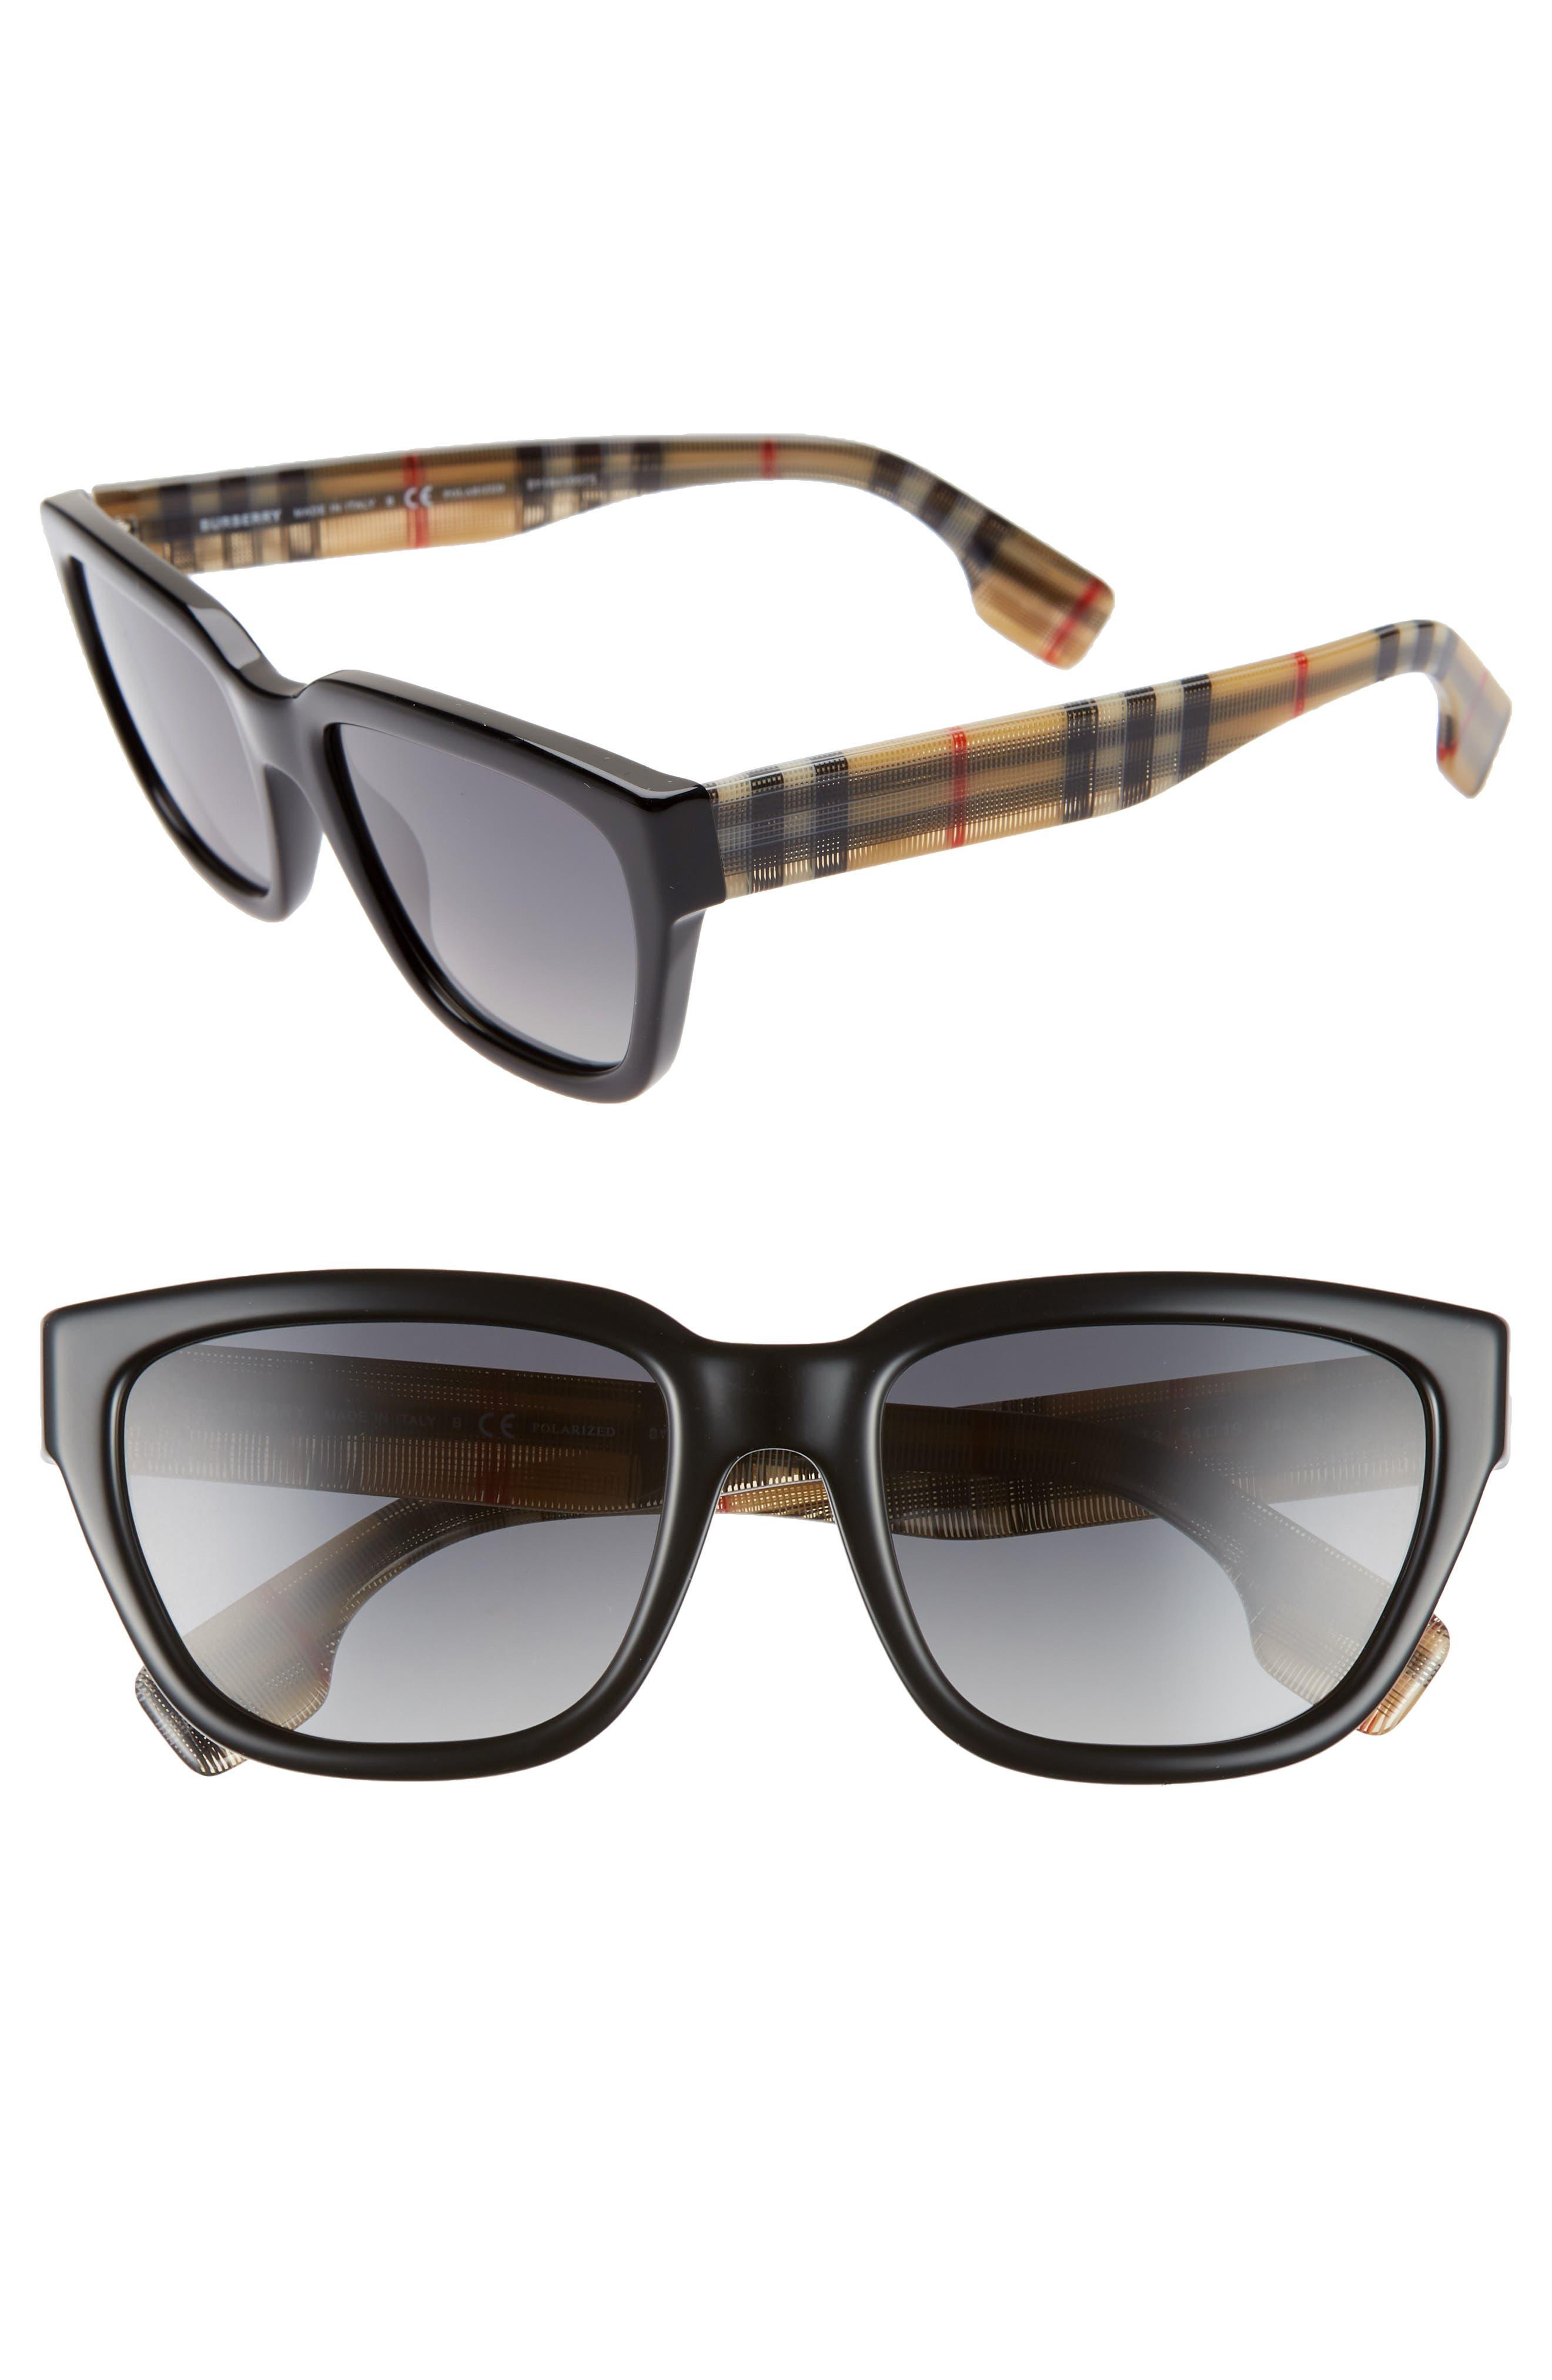 54mm Polarized Gradient Square Sunglasses,                             Main thumbnail 1, color,                             BLACK/ BLACK GRADIENT